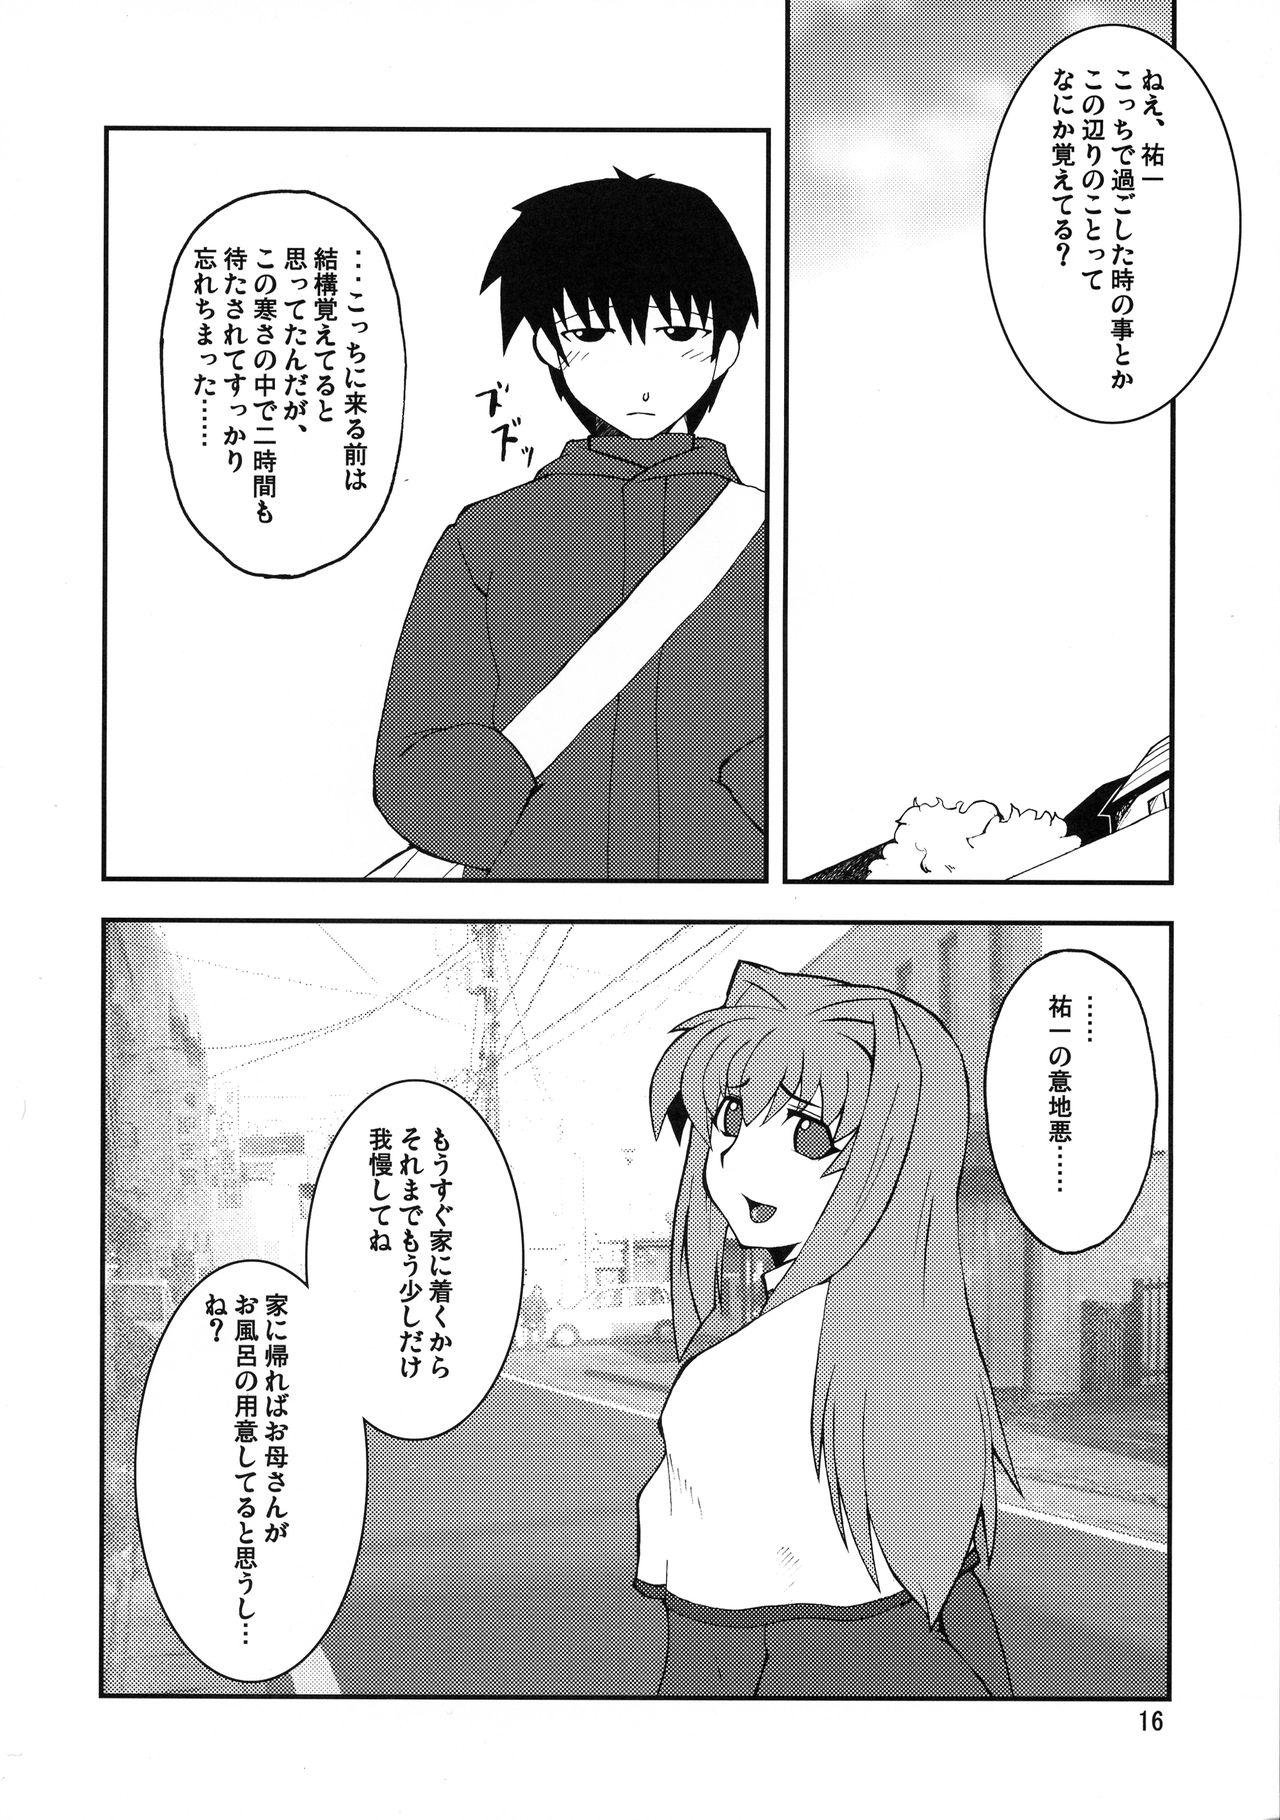 Kyouki Vol. 3~5 Remake Ver. 15